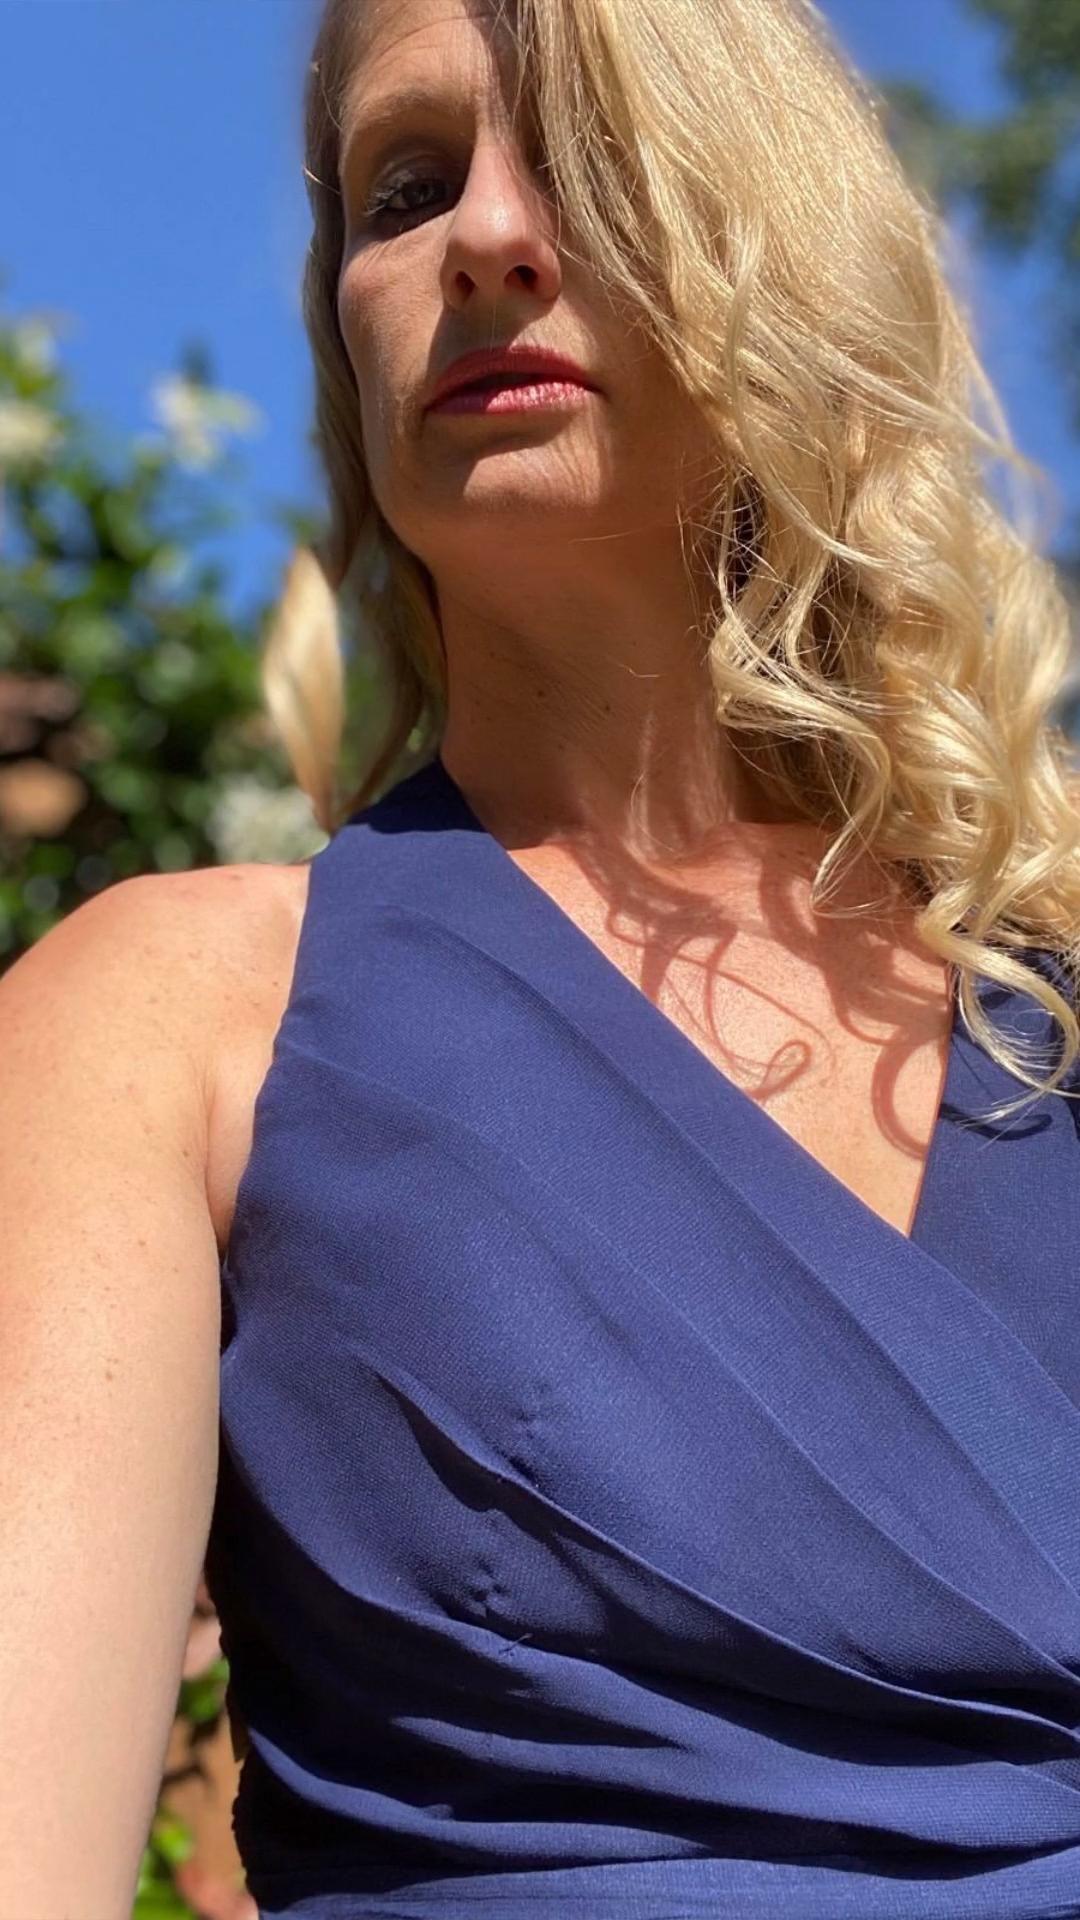 Matchimony Halterneck Navy Blue Bridesmaid Dress #matchimony #navyblue #wedding #bridesmaiddress